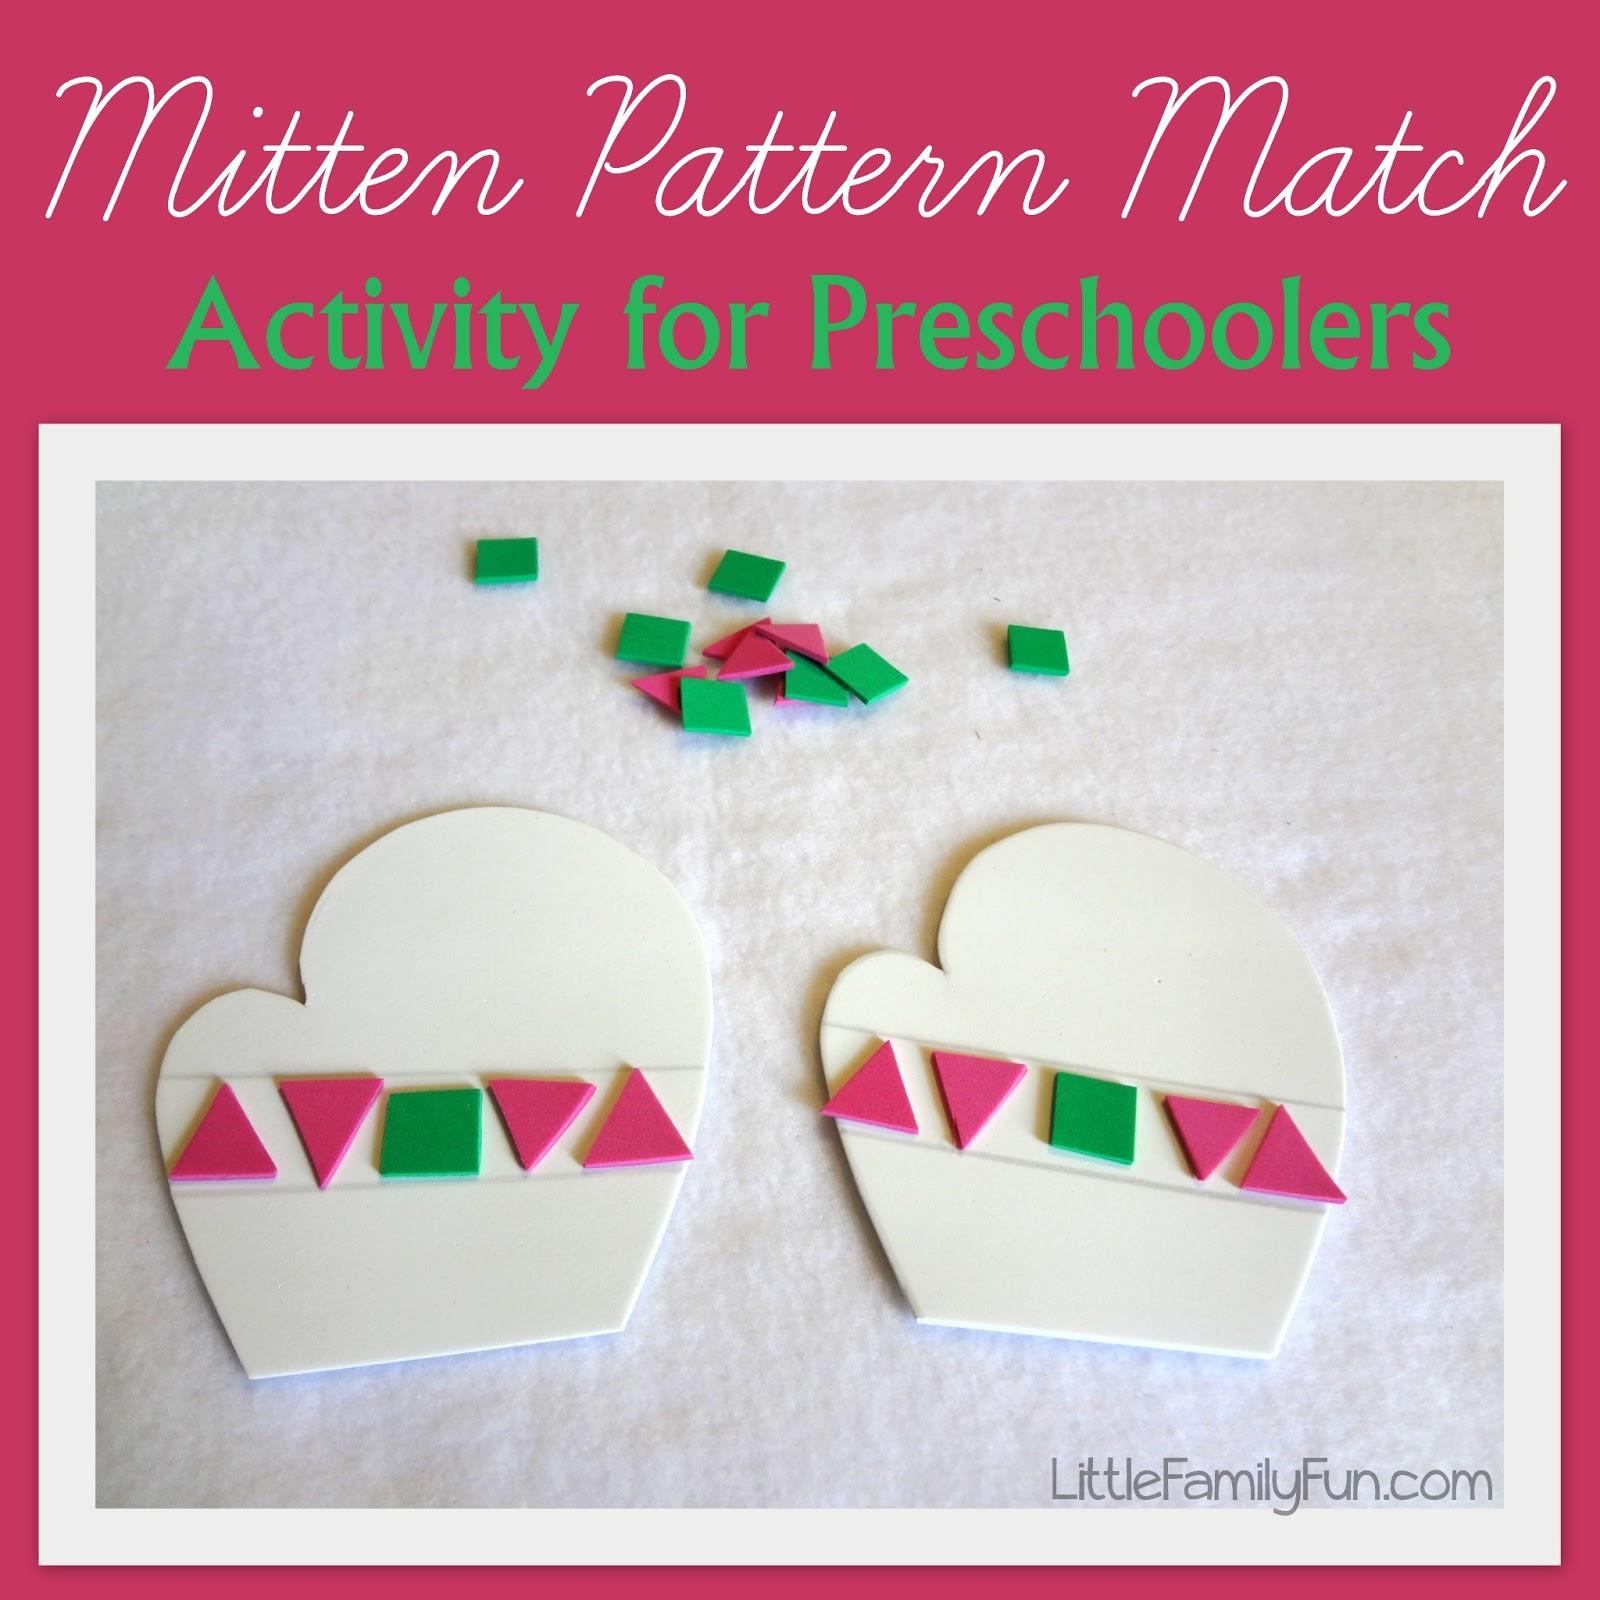 Little Family Fun Mitten Pattern Match Activity For